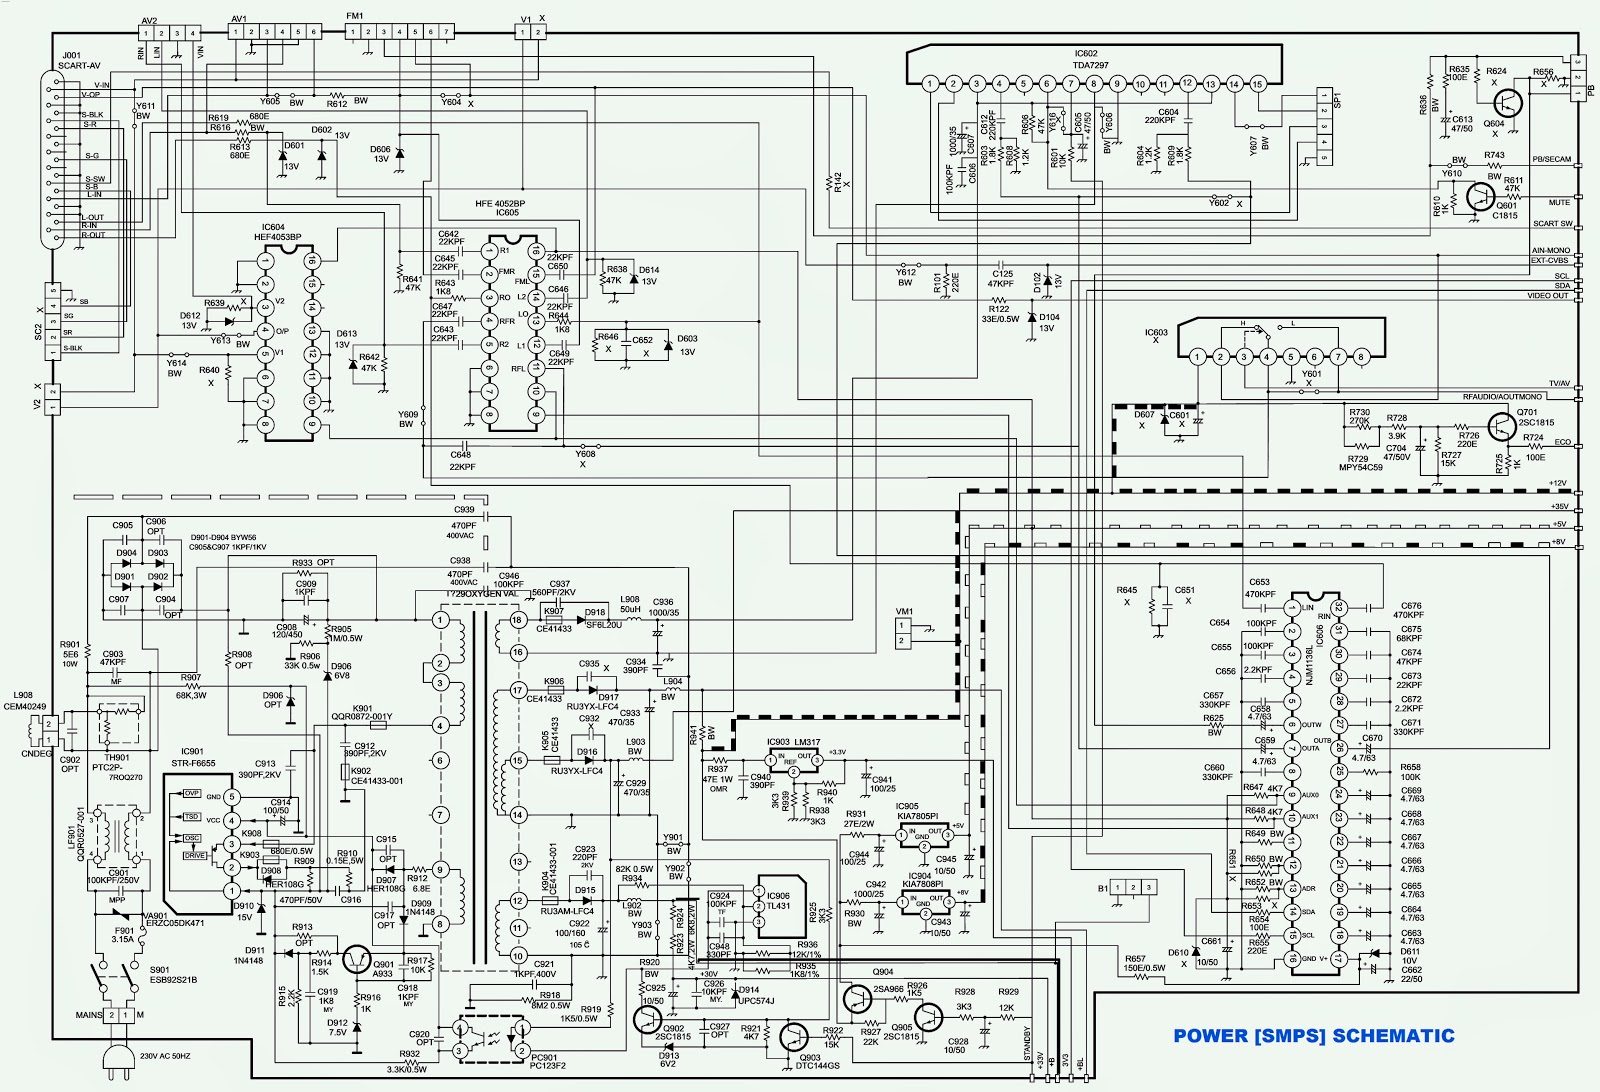 Toshiba Tv Circuit Diagram Wiring Libraries Diagrams Led Schematic Simple Diagramslg Data Schema